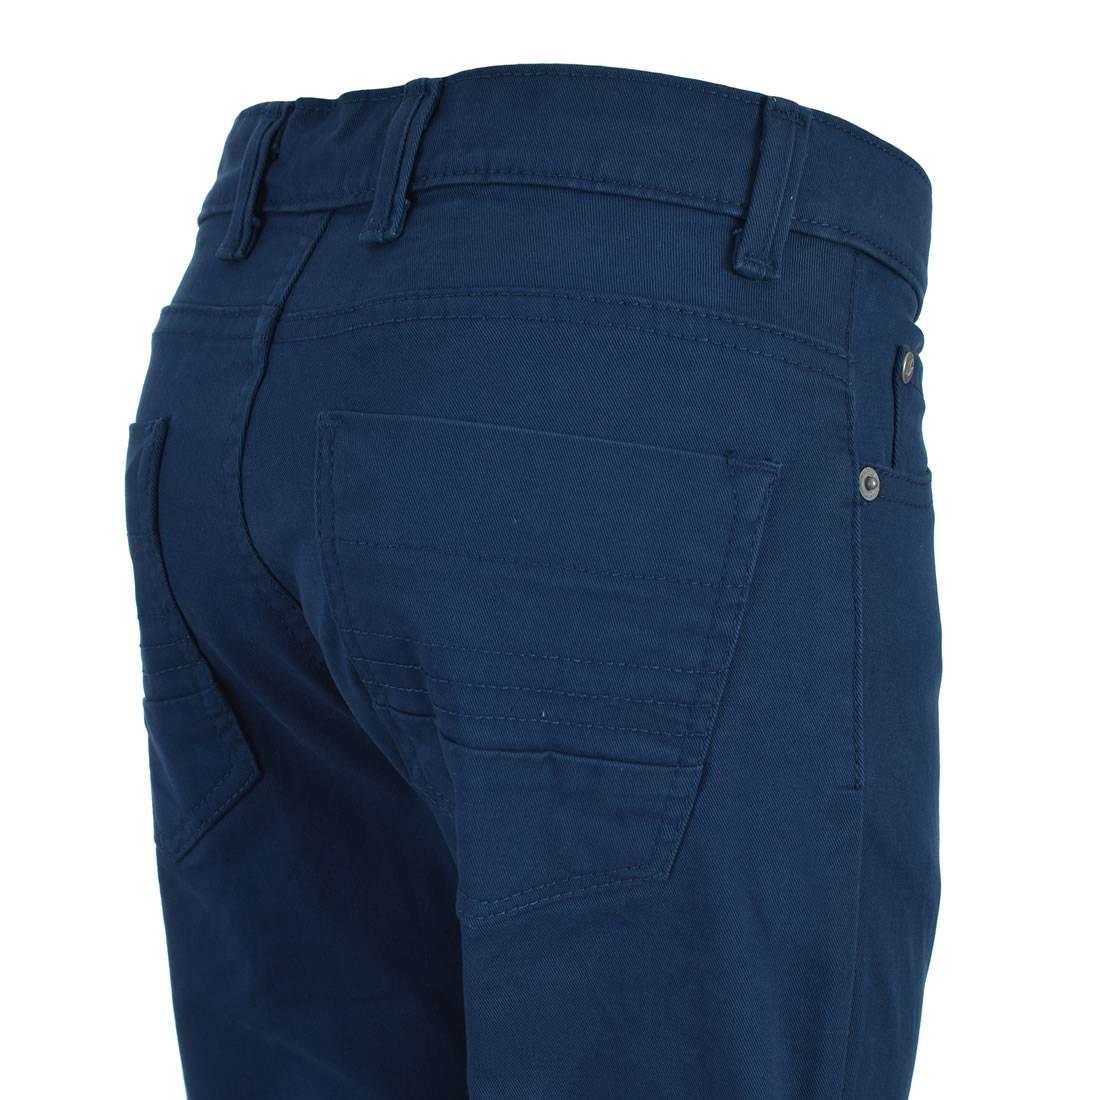 021109065414-04-Pantalon-Vaquero-Boys-Gabardina-Con-Elastano-Skinny-Fit-Cintura-Ajustable-Azul-Plumbago-yale